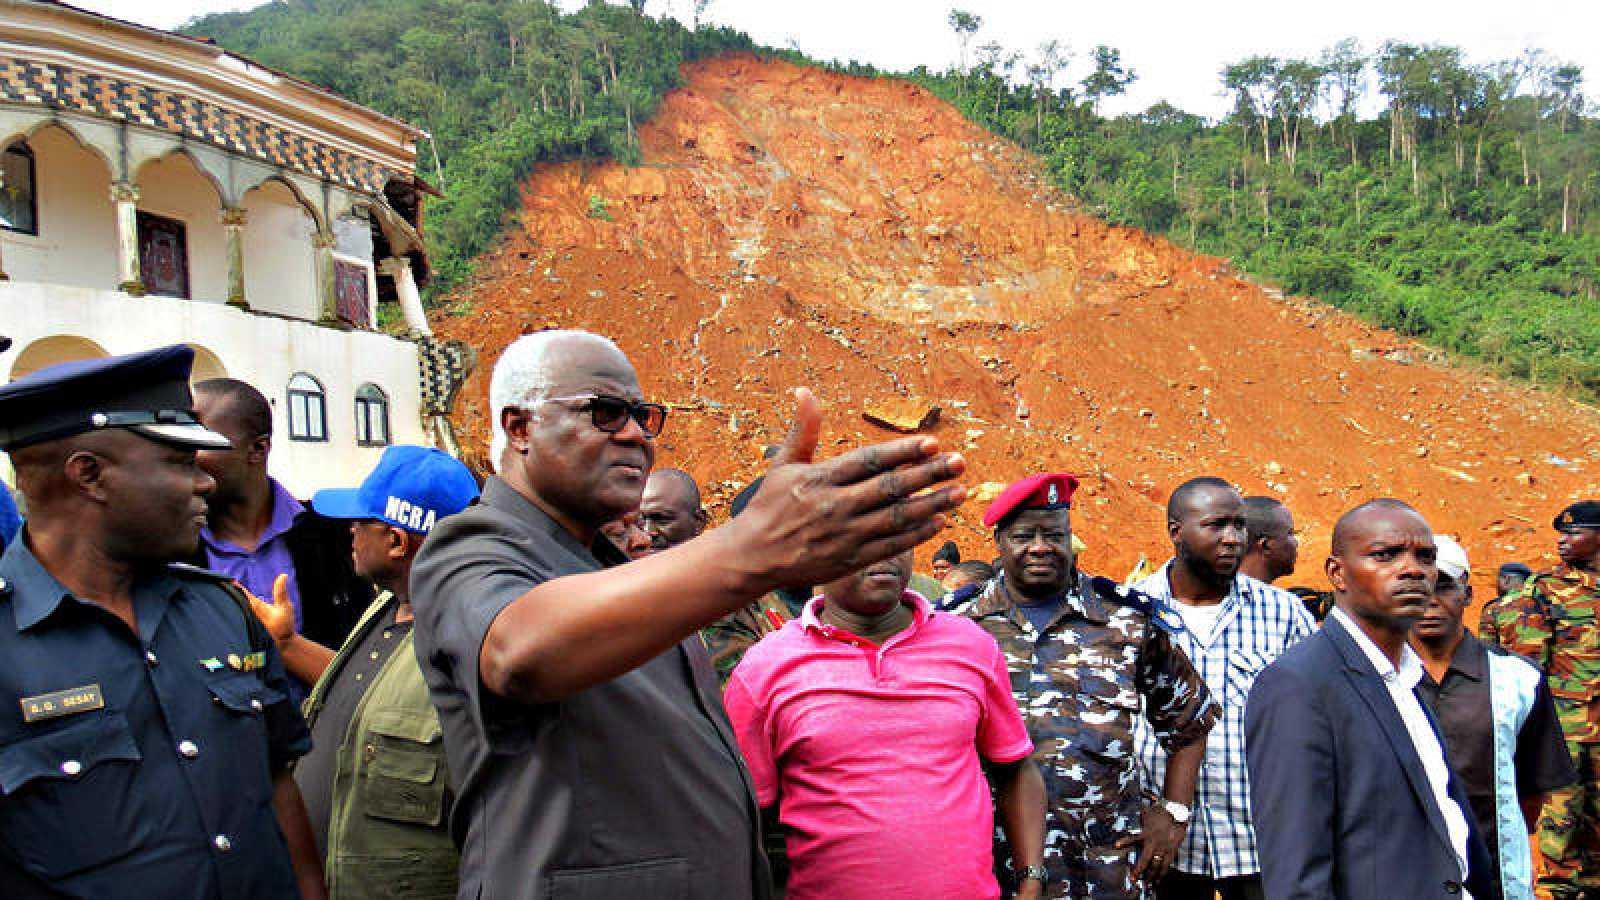 El presidente de Sierra Leona, Ernest Bai Koroma, durante su visita al desprendimiento de Regent